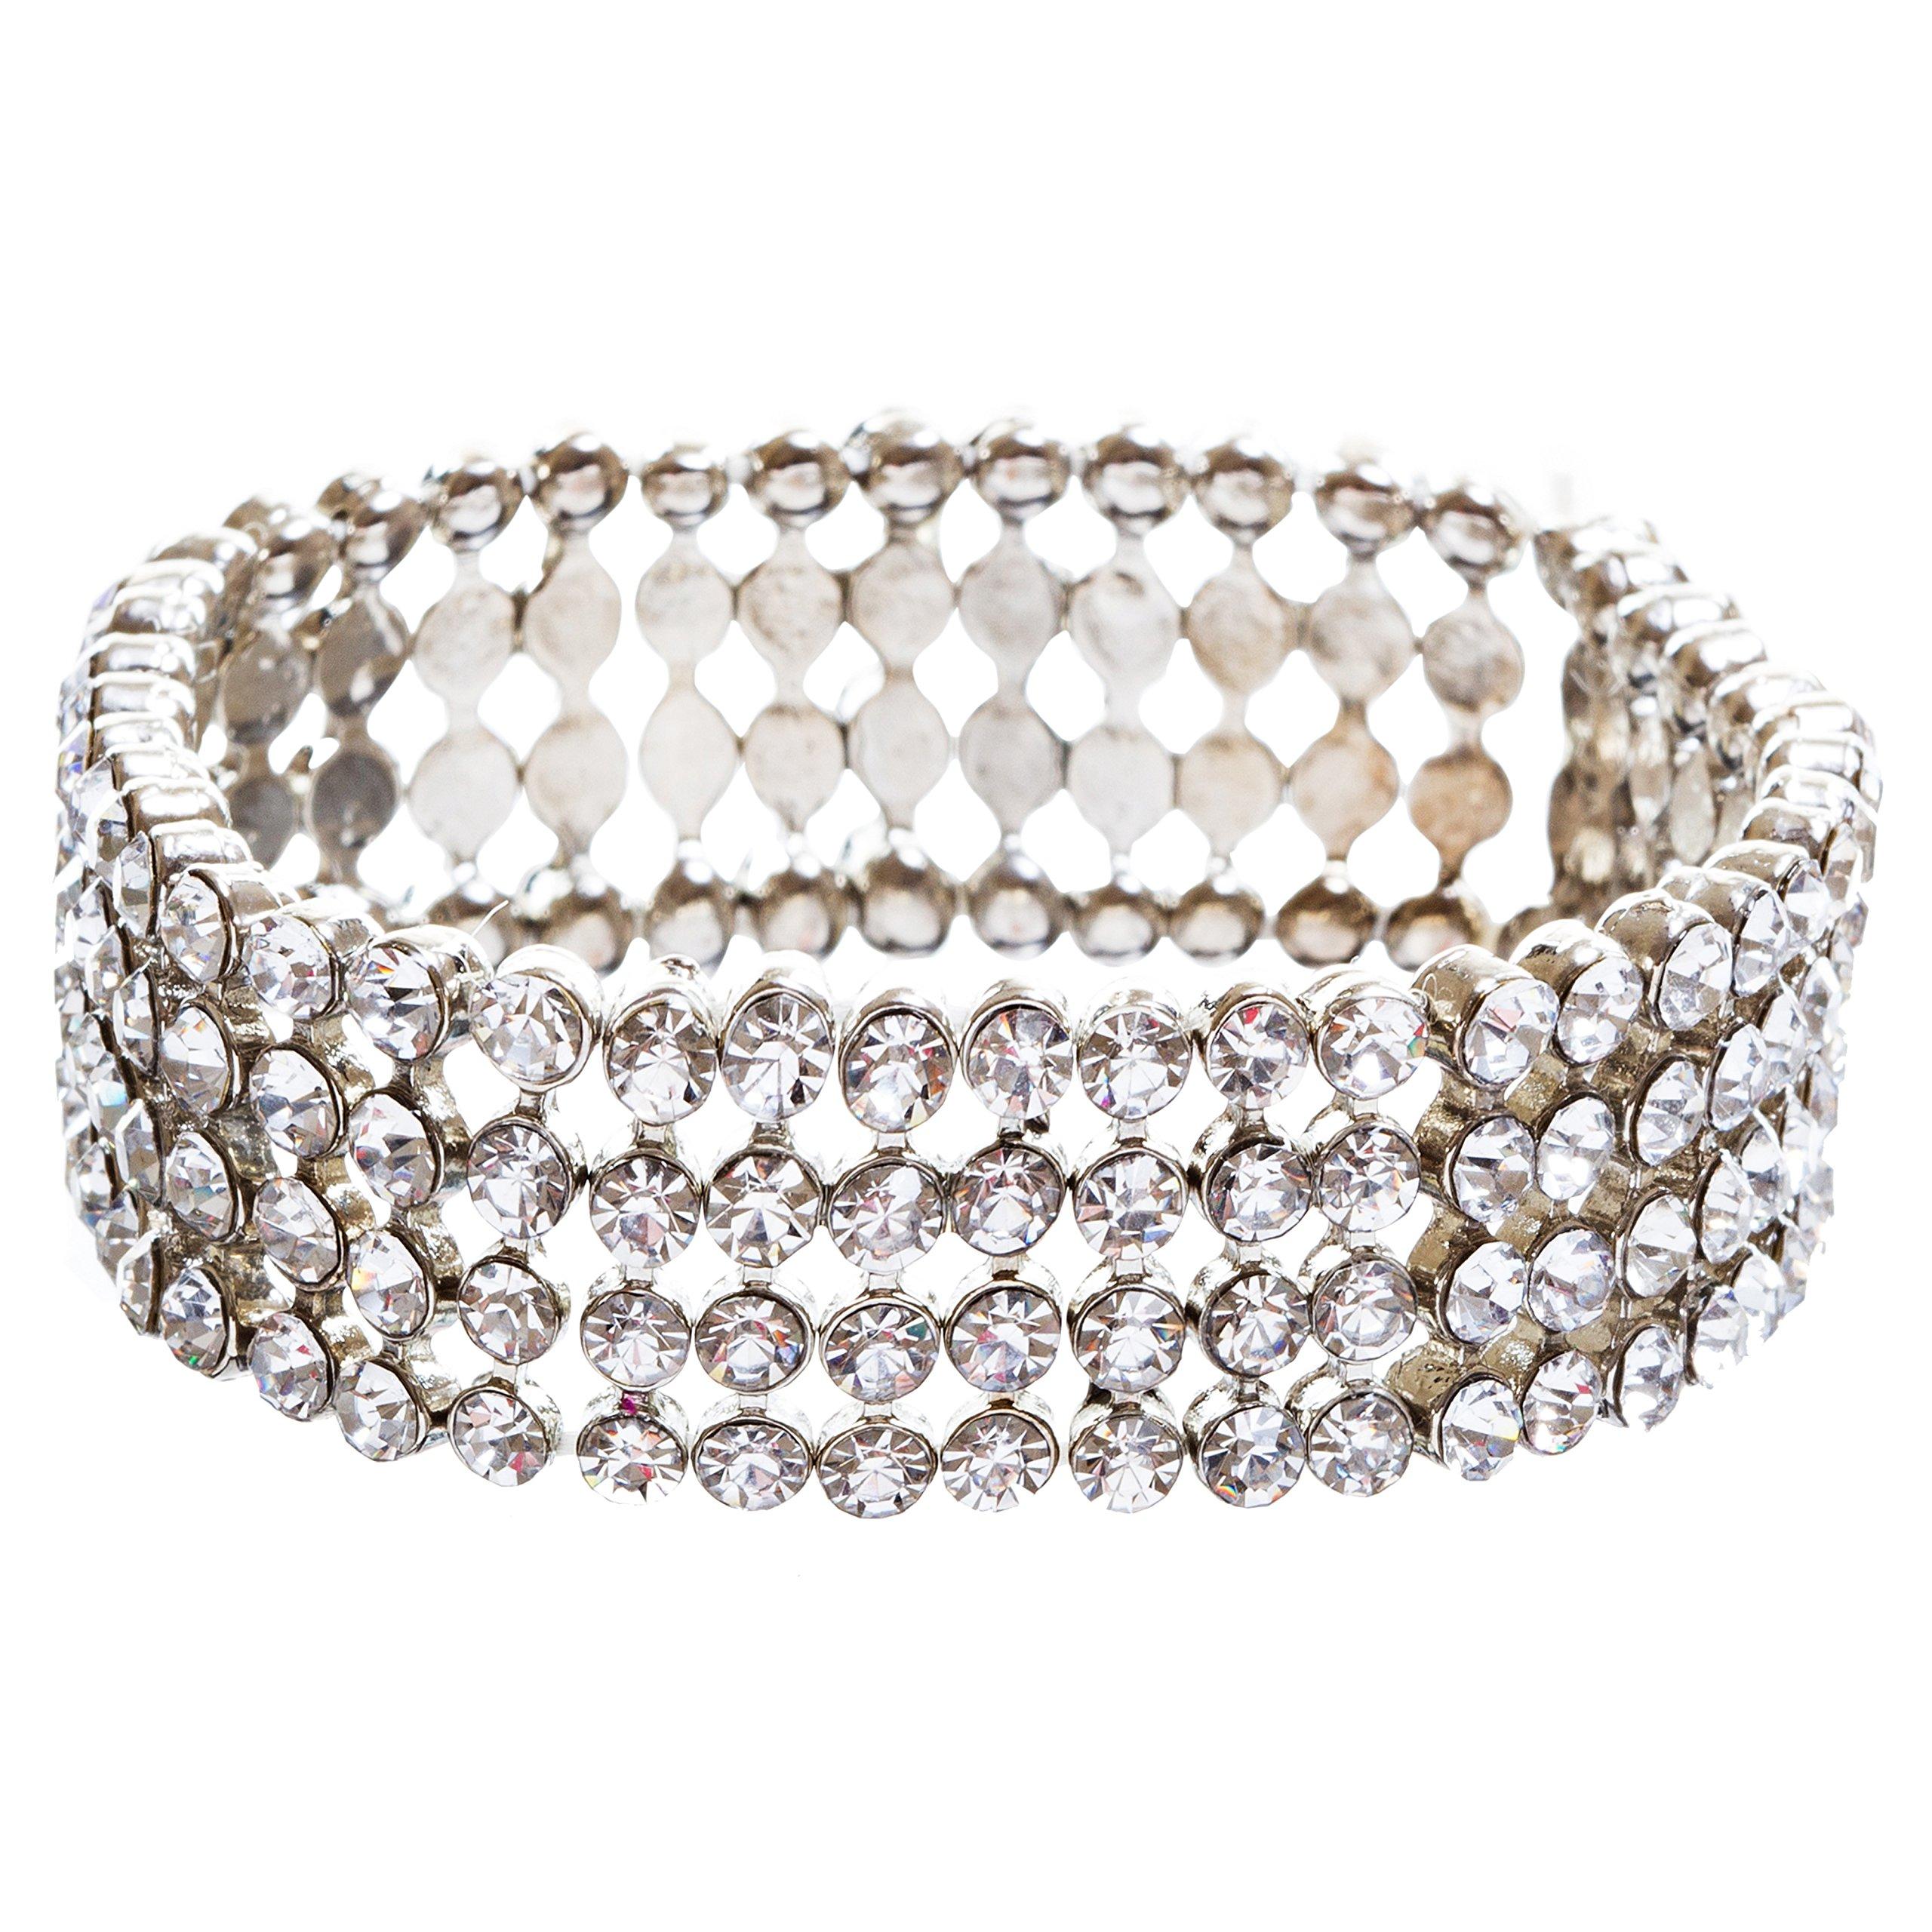 ACCESSORIESFOREVER Bridal Wedding Jewelry Crystal Rhinestone Beautiful Wrap Around Bracelet B263 Silver